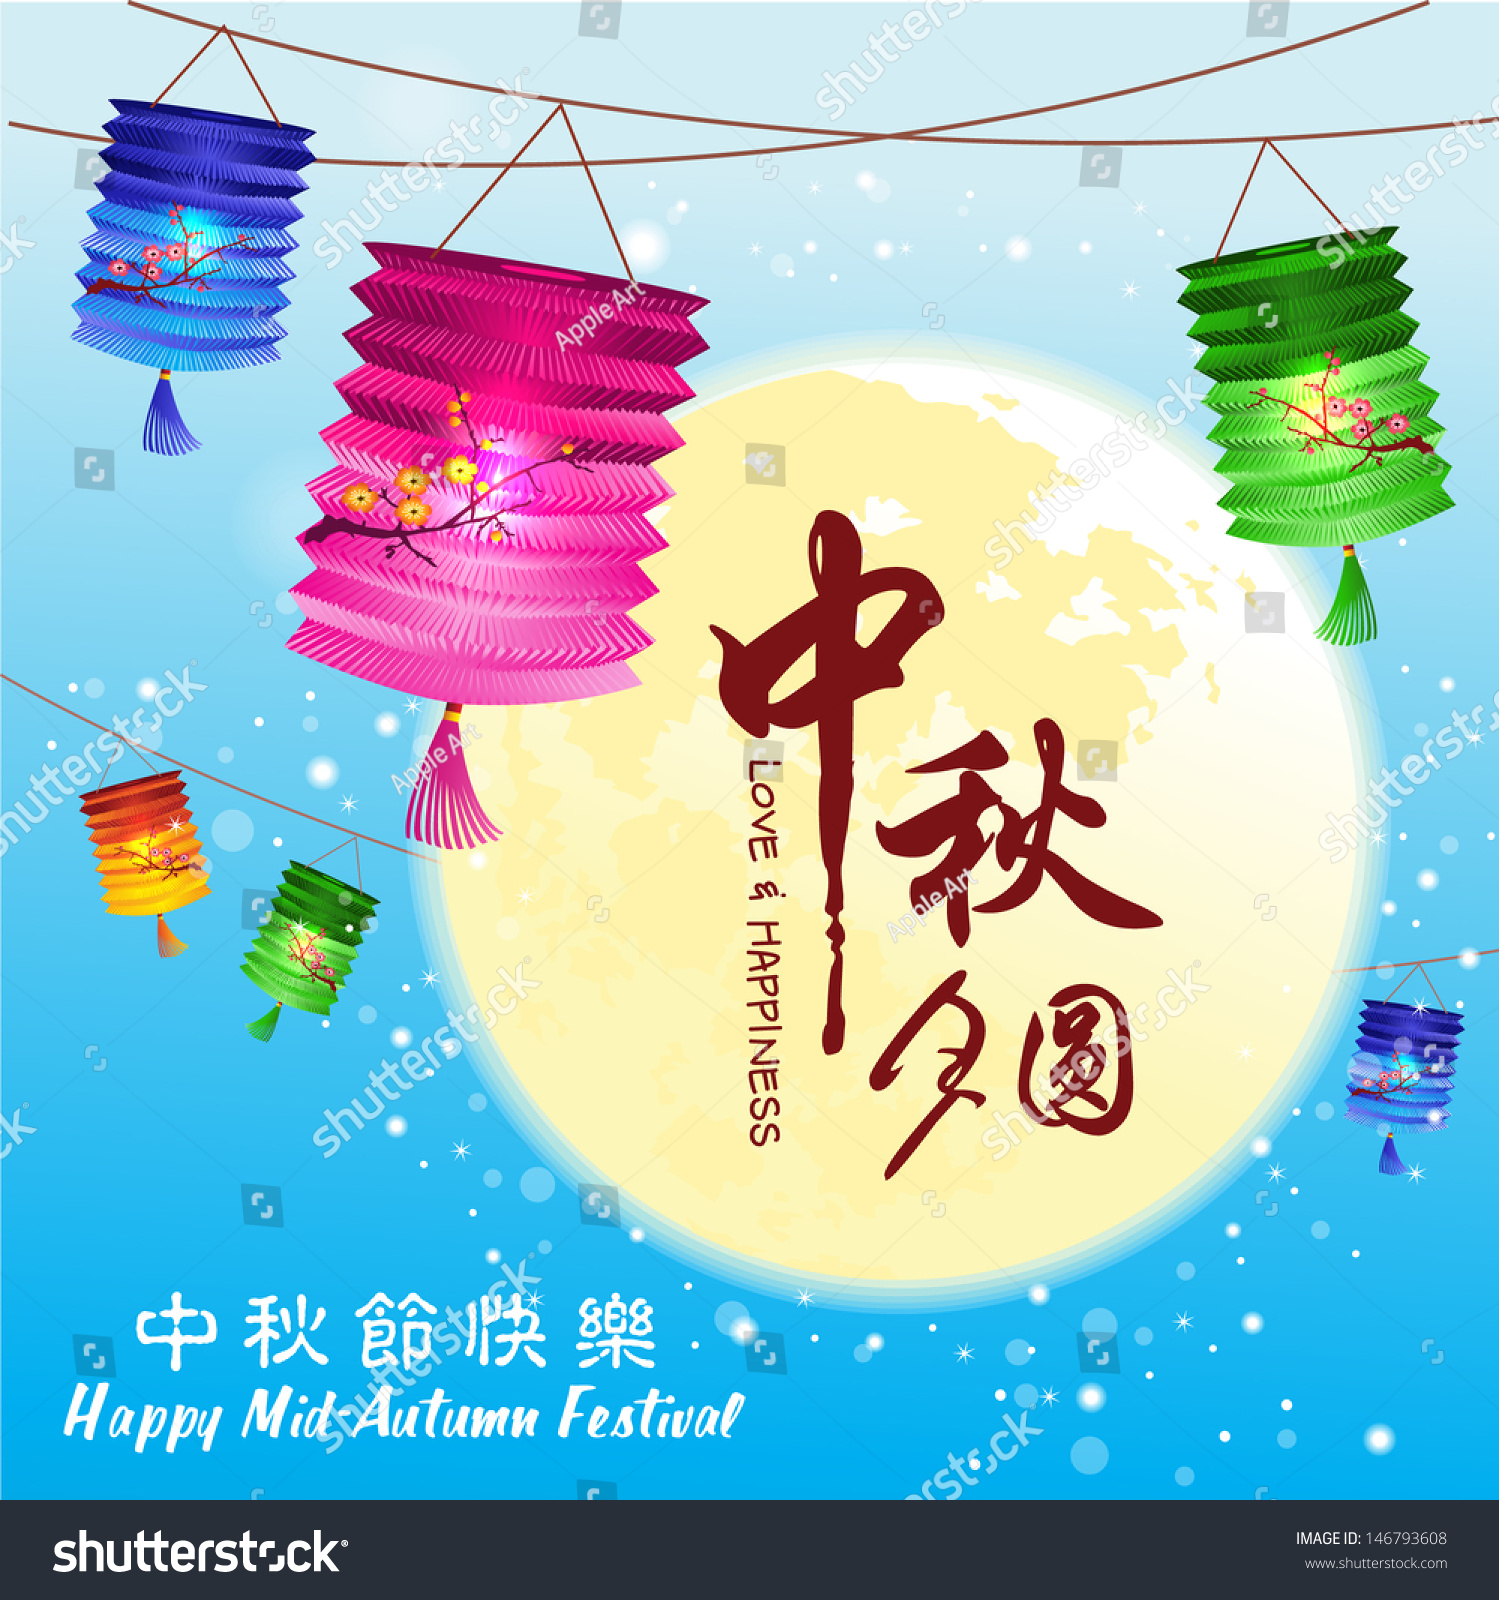 10 Best Festivals in Vietnam